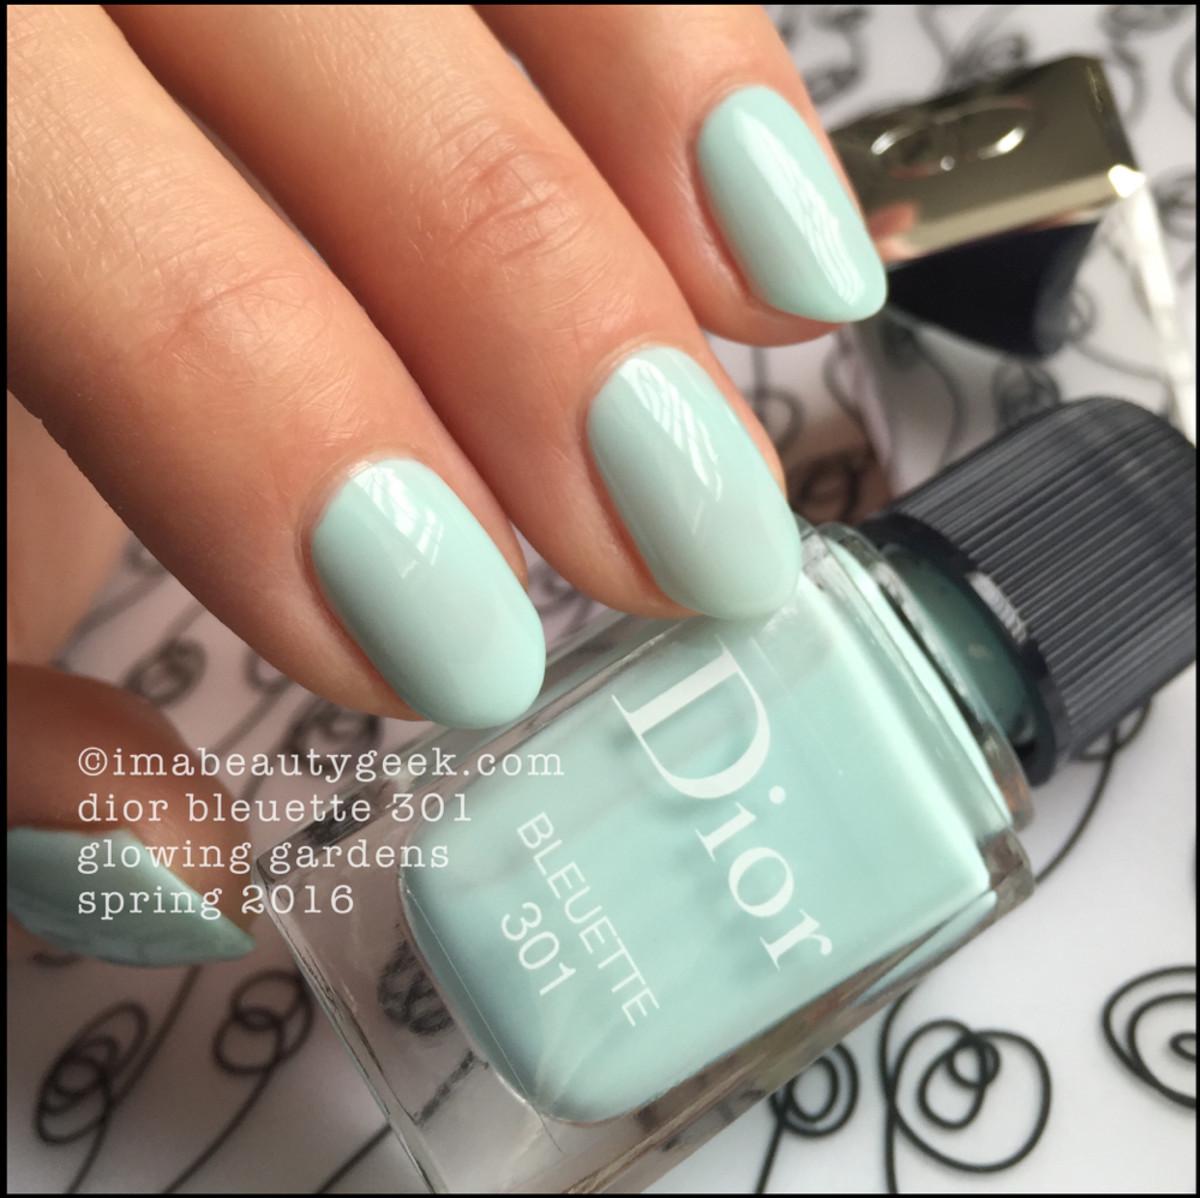 Dior Bleuette 301 Vernis_Dior Glowing Gardens Spring 2016